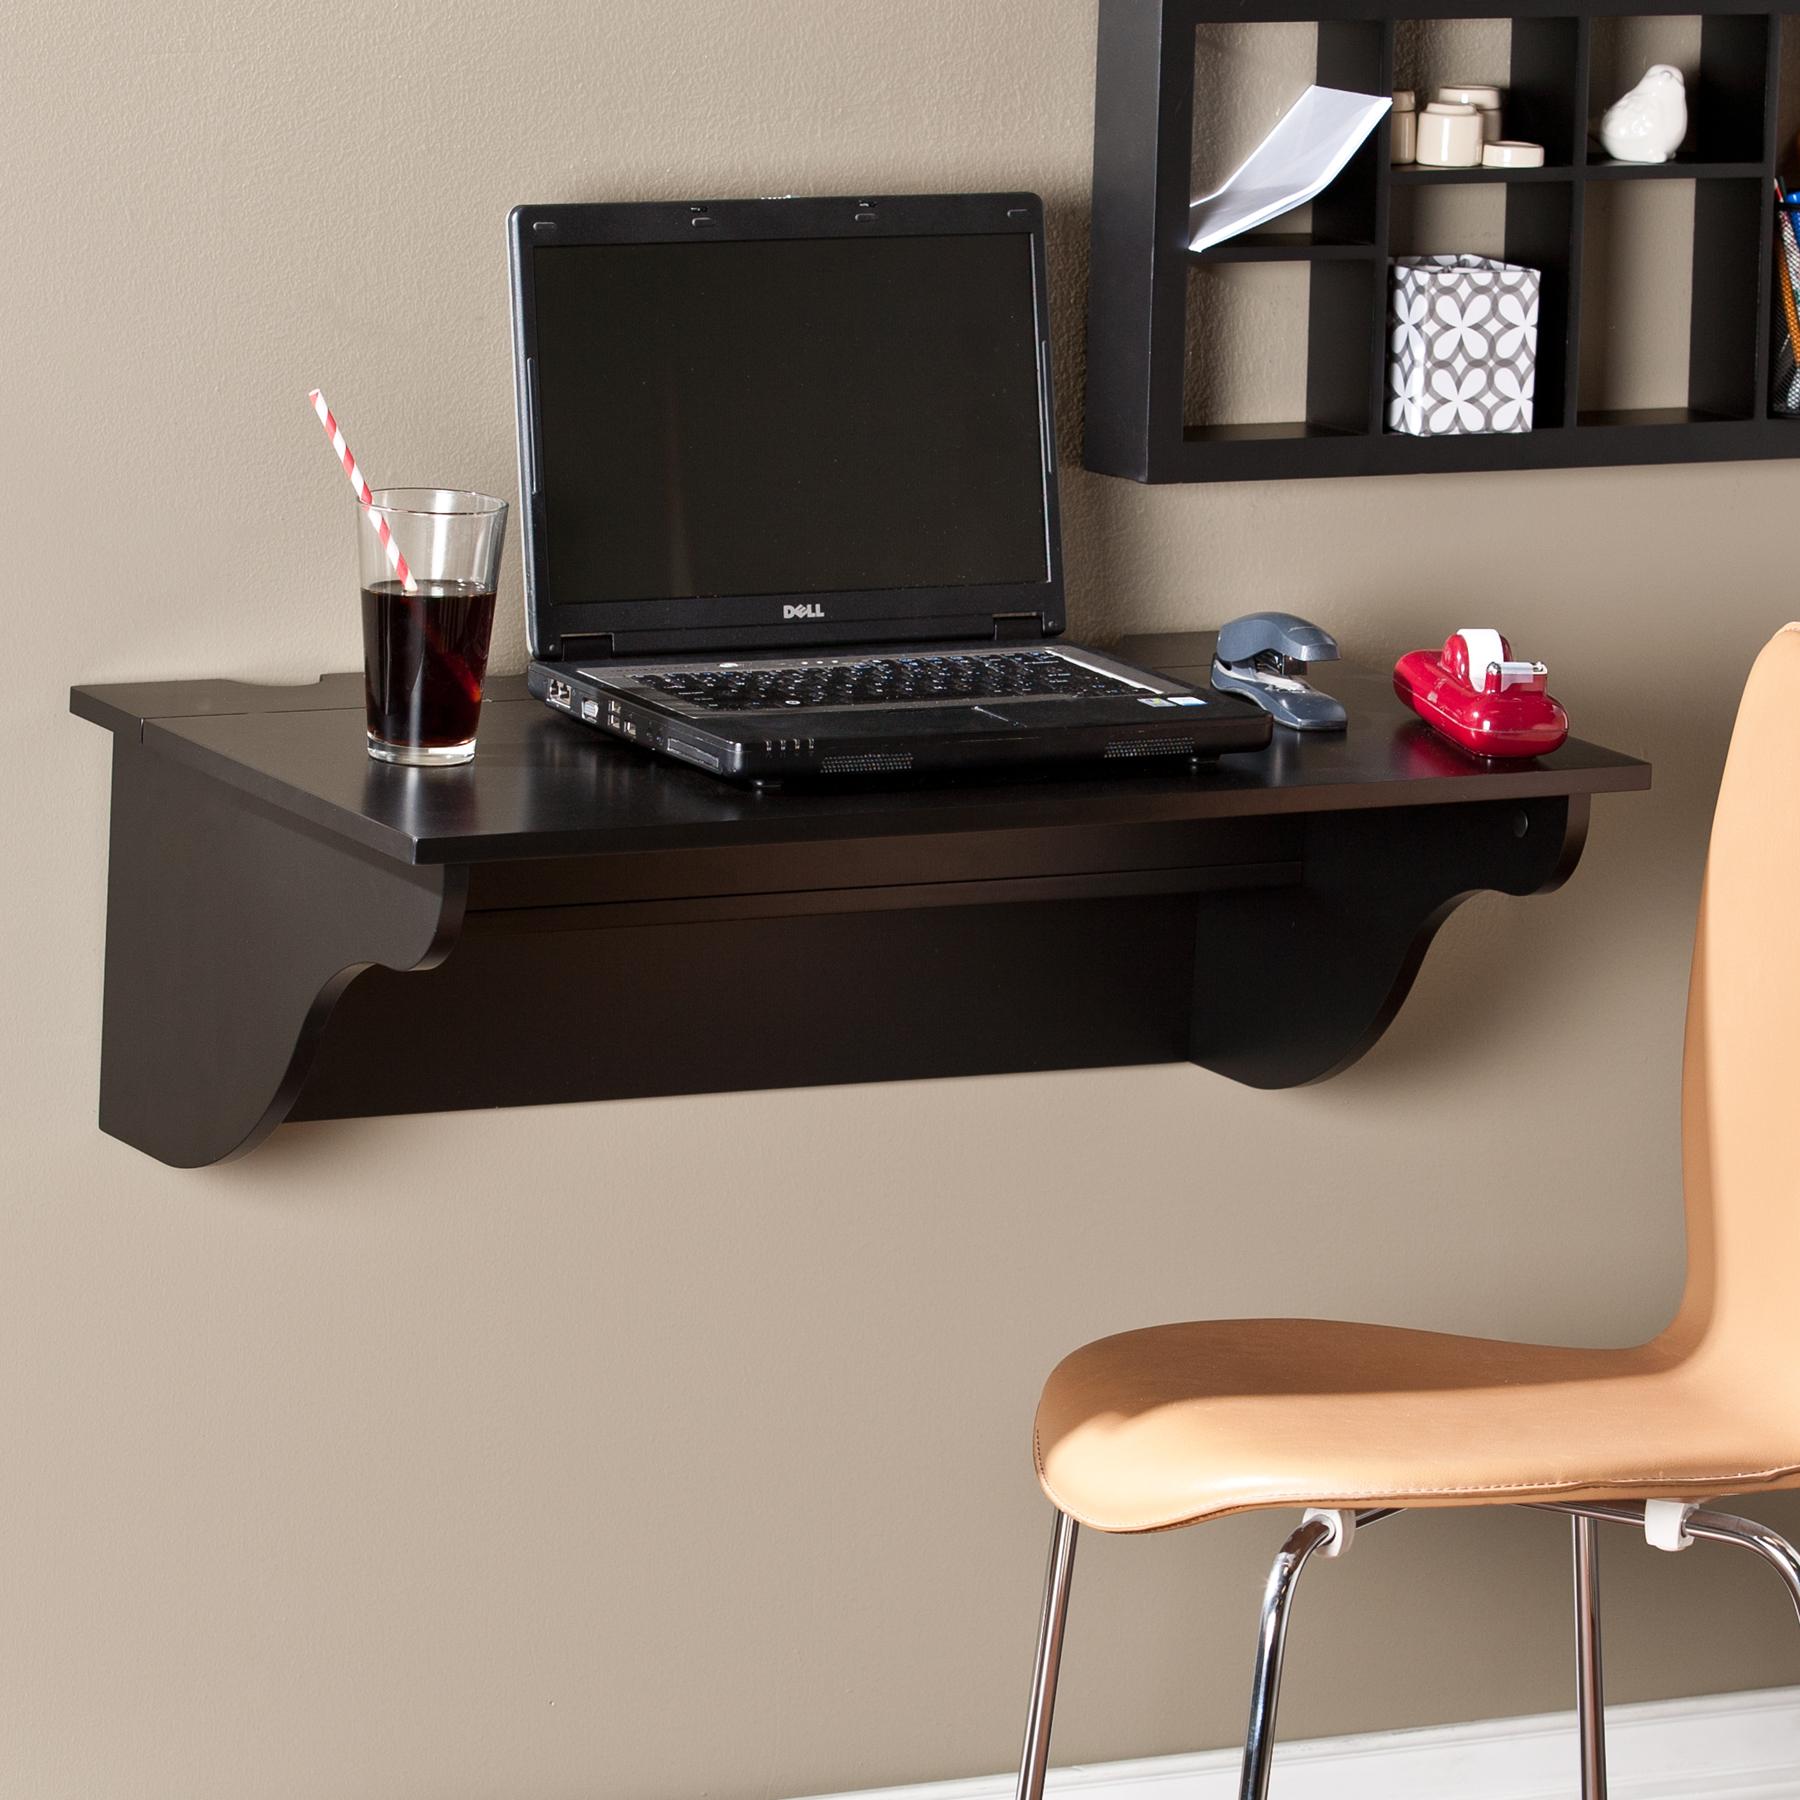 Barrie Wall Mount Desk Ledge Black